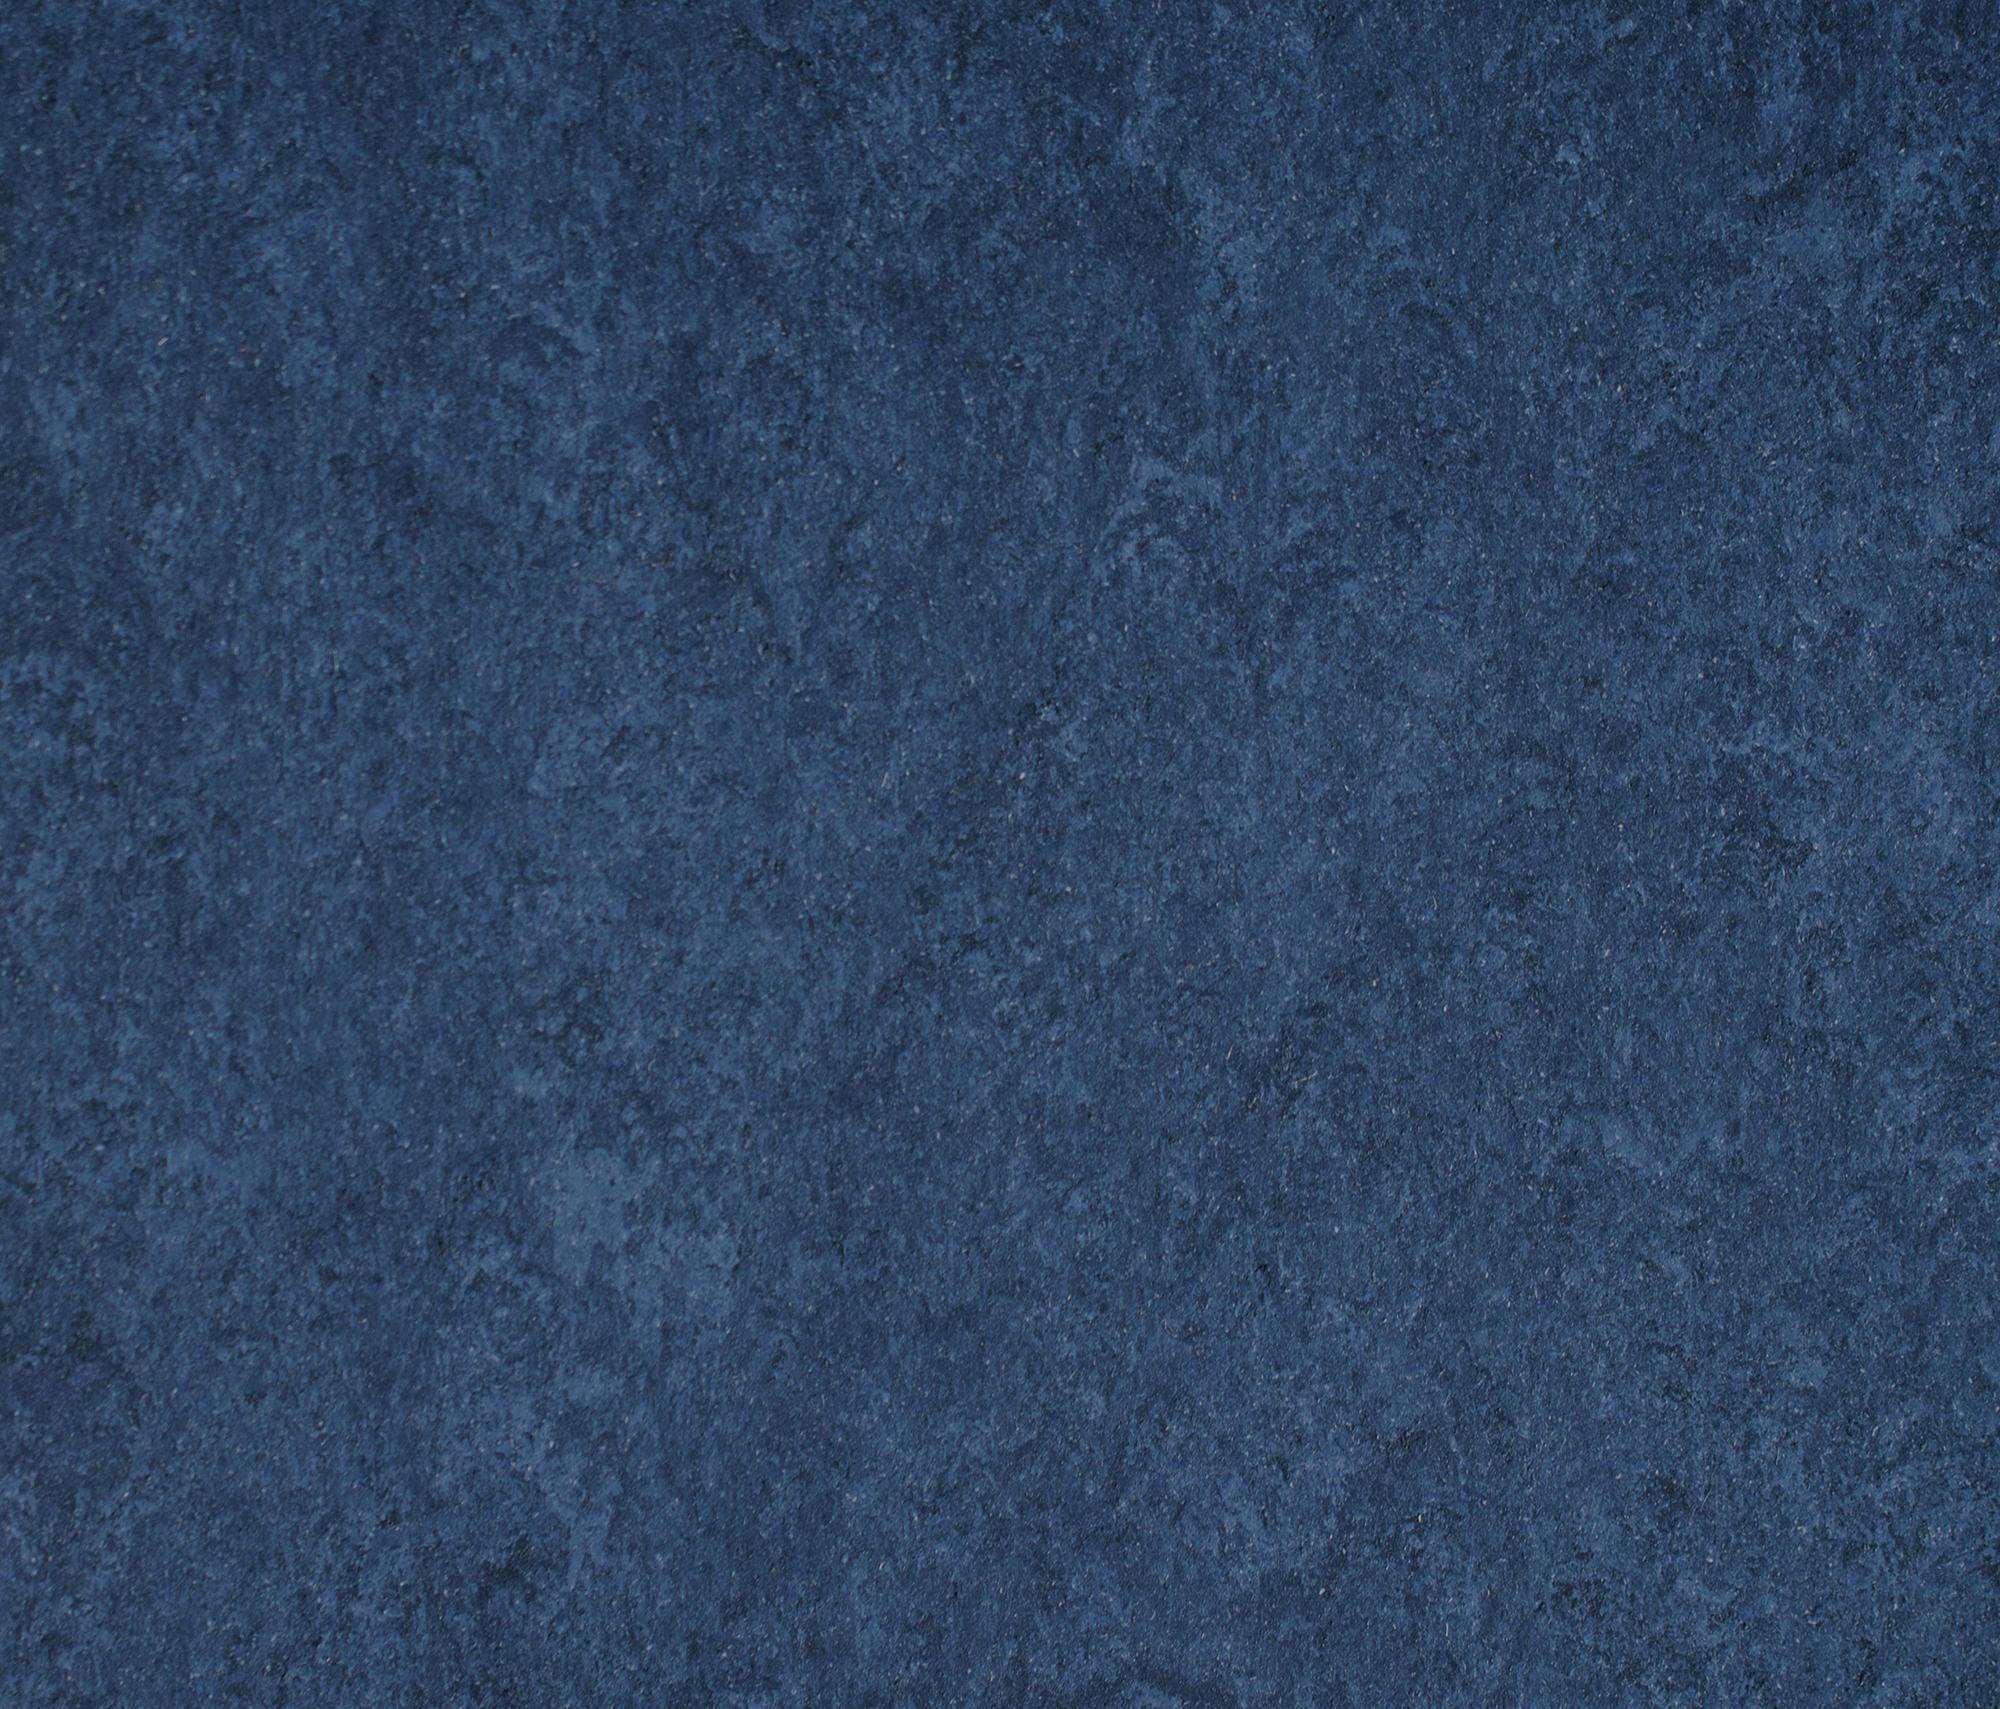 marmorette lpx 121 149 pavimenti in linoleum armstrong. Black Bedroom Furniture Sets. Home Design Ideas